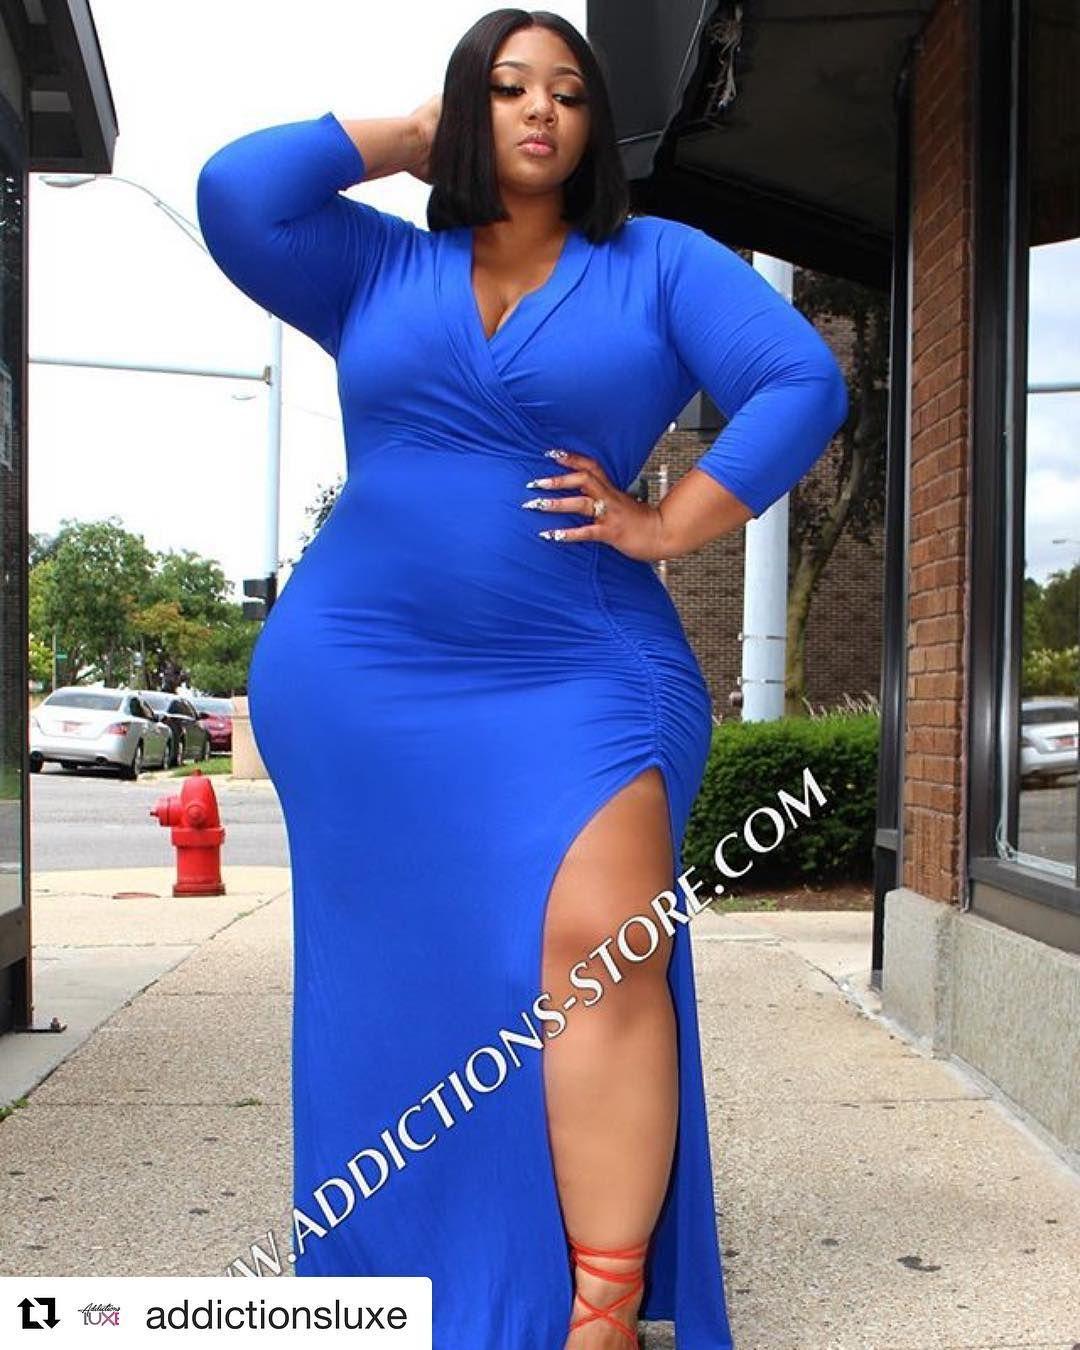 repost @addictionsluxe (@get_repost) ・・・ open till 4pm aria dress